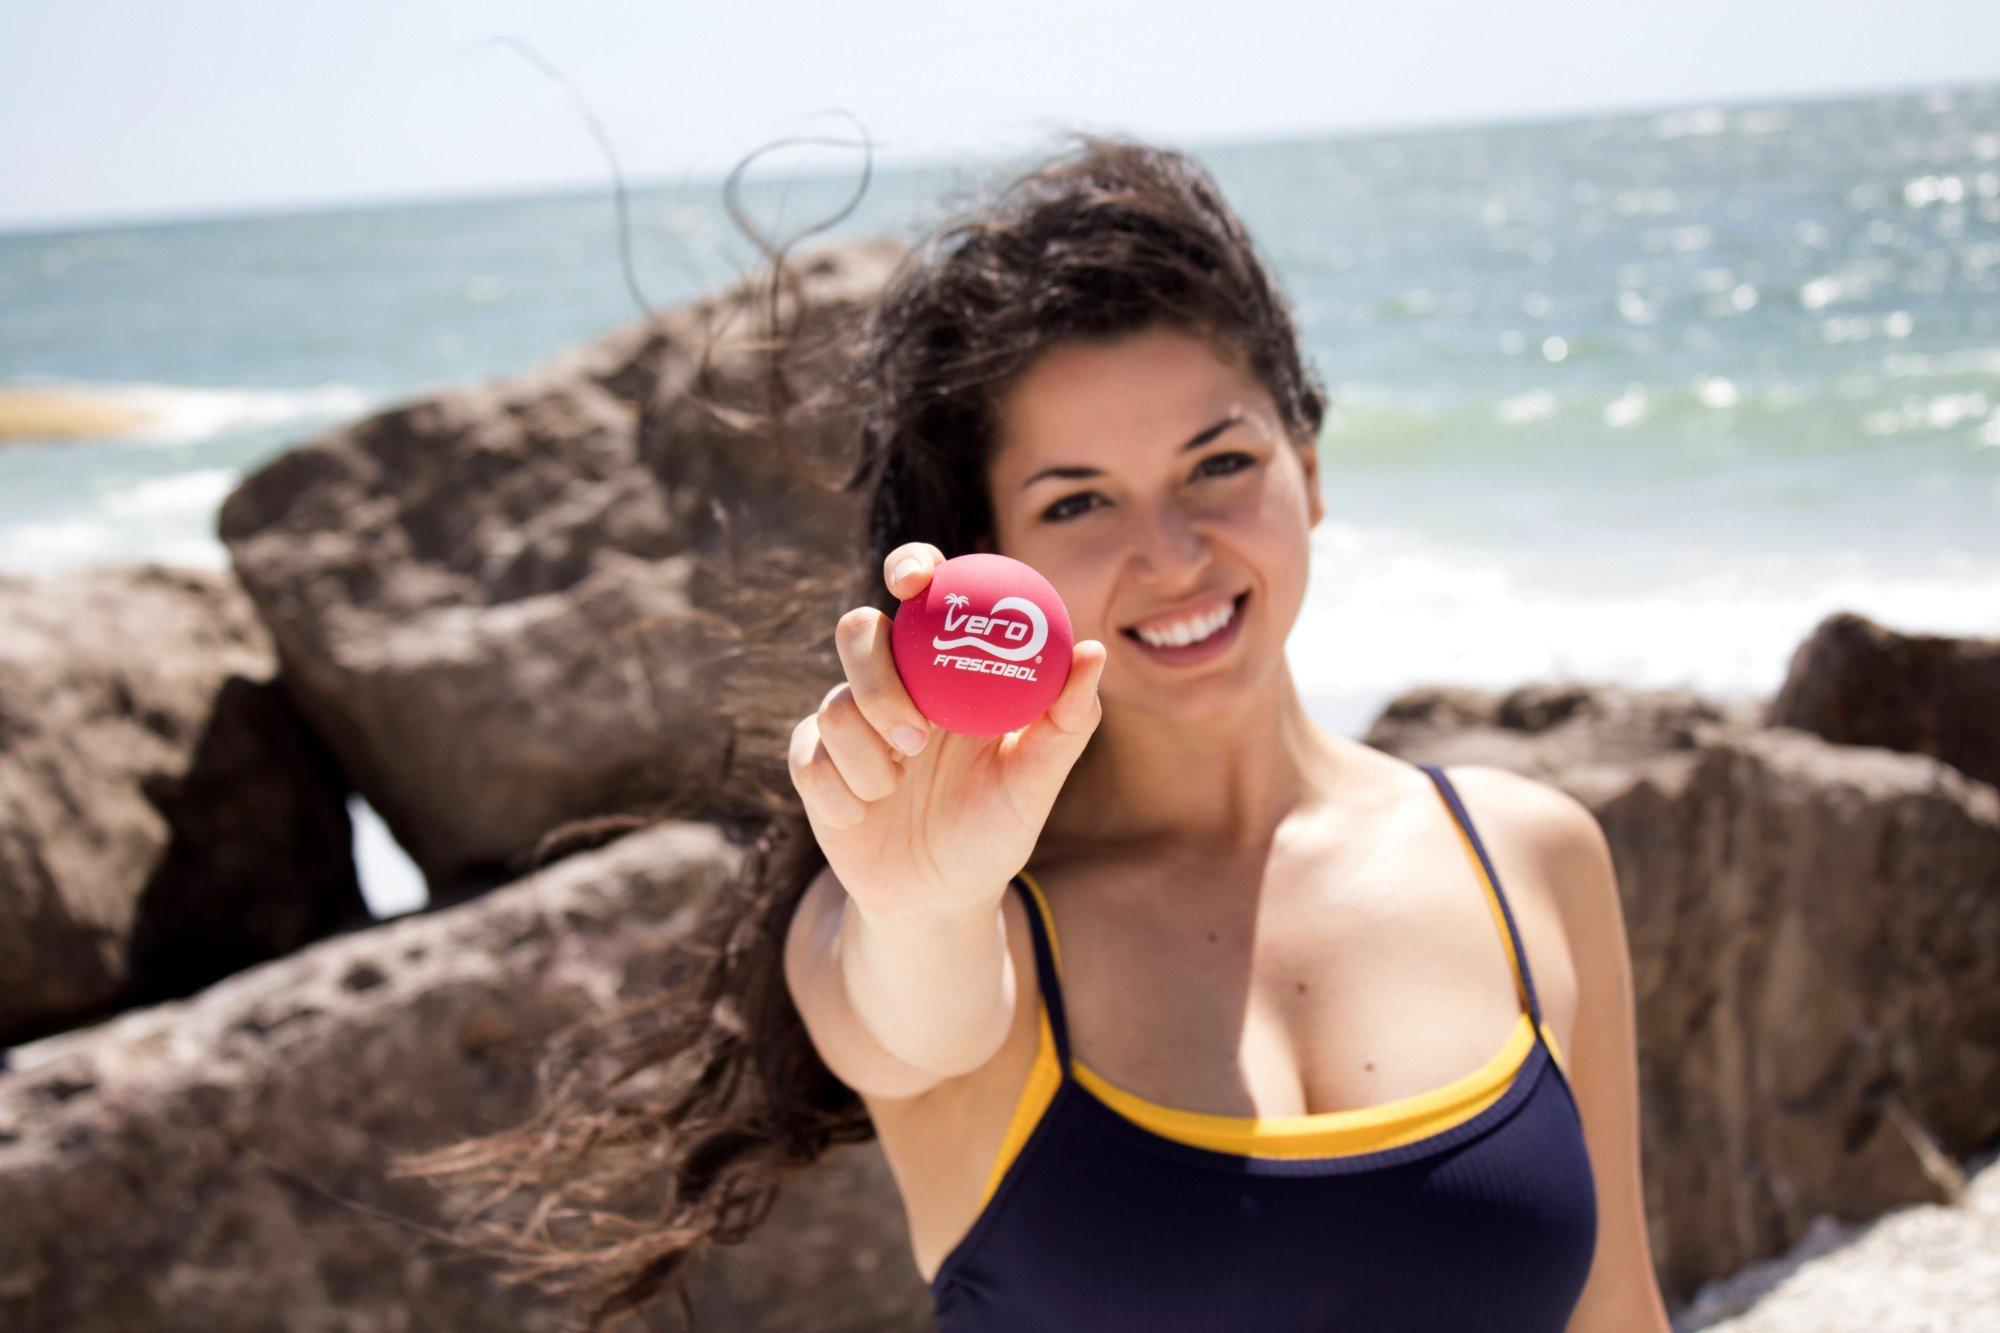 Frescobol Fiberglass Beach Paddleball Paddle Set, Official Ball, Bag by Frescobol (Image #4)